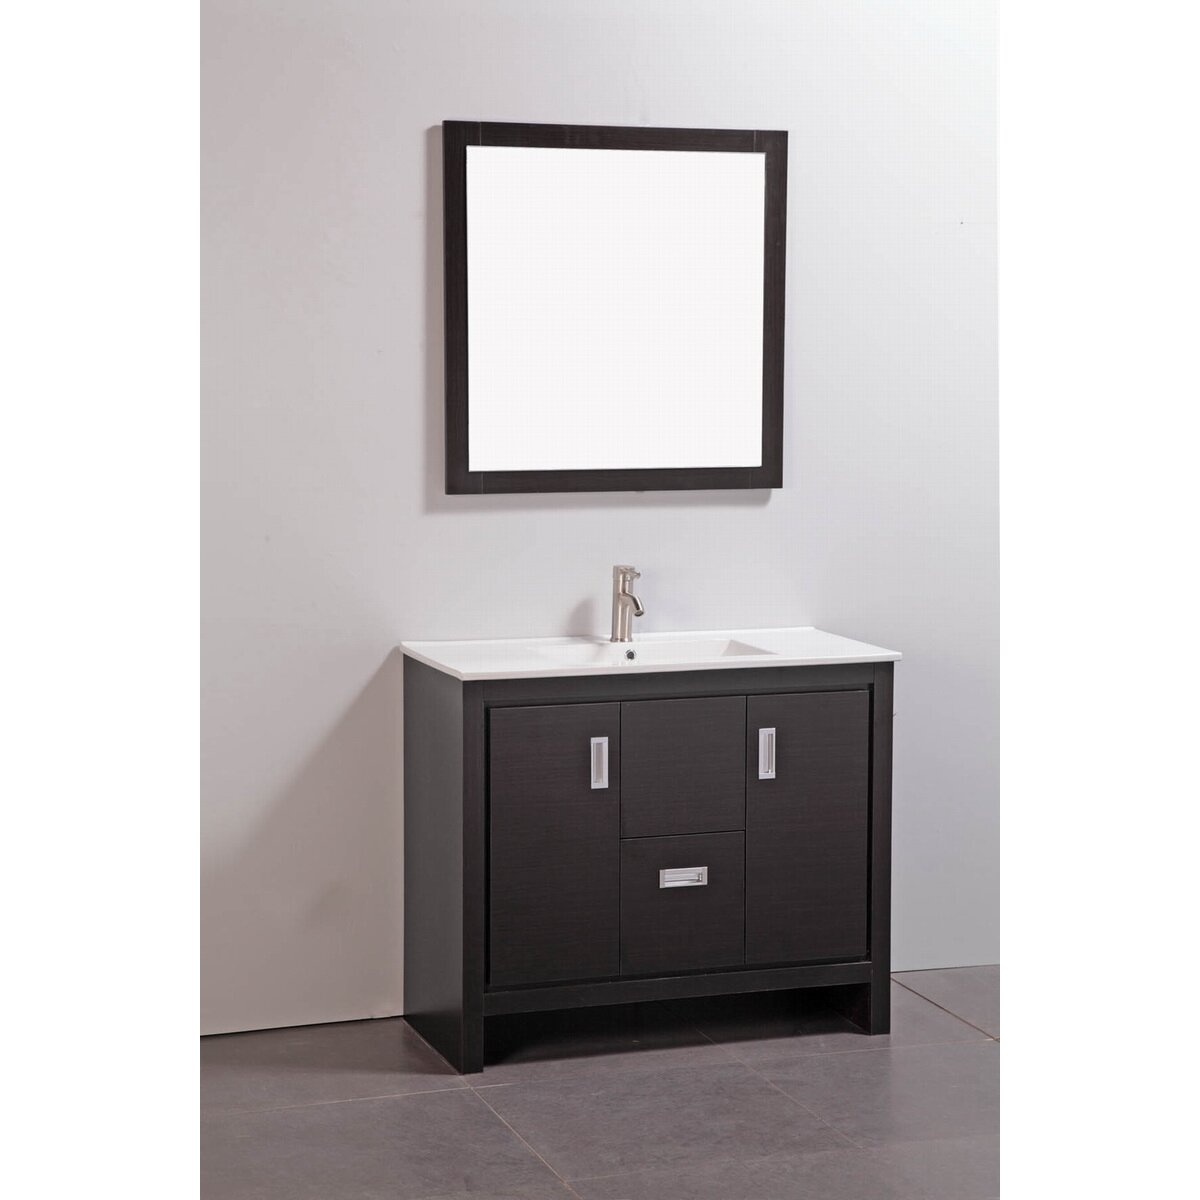 "39"" Single Bathroom Vanity Set with Mirror"